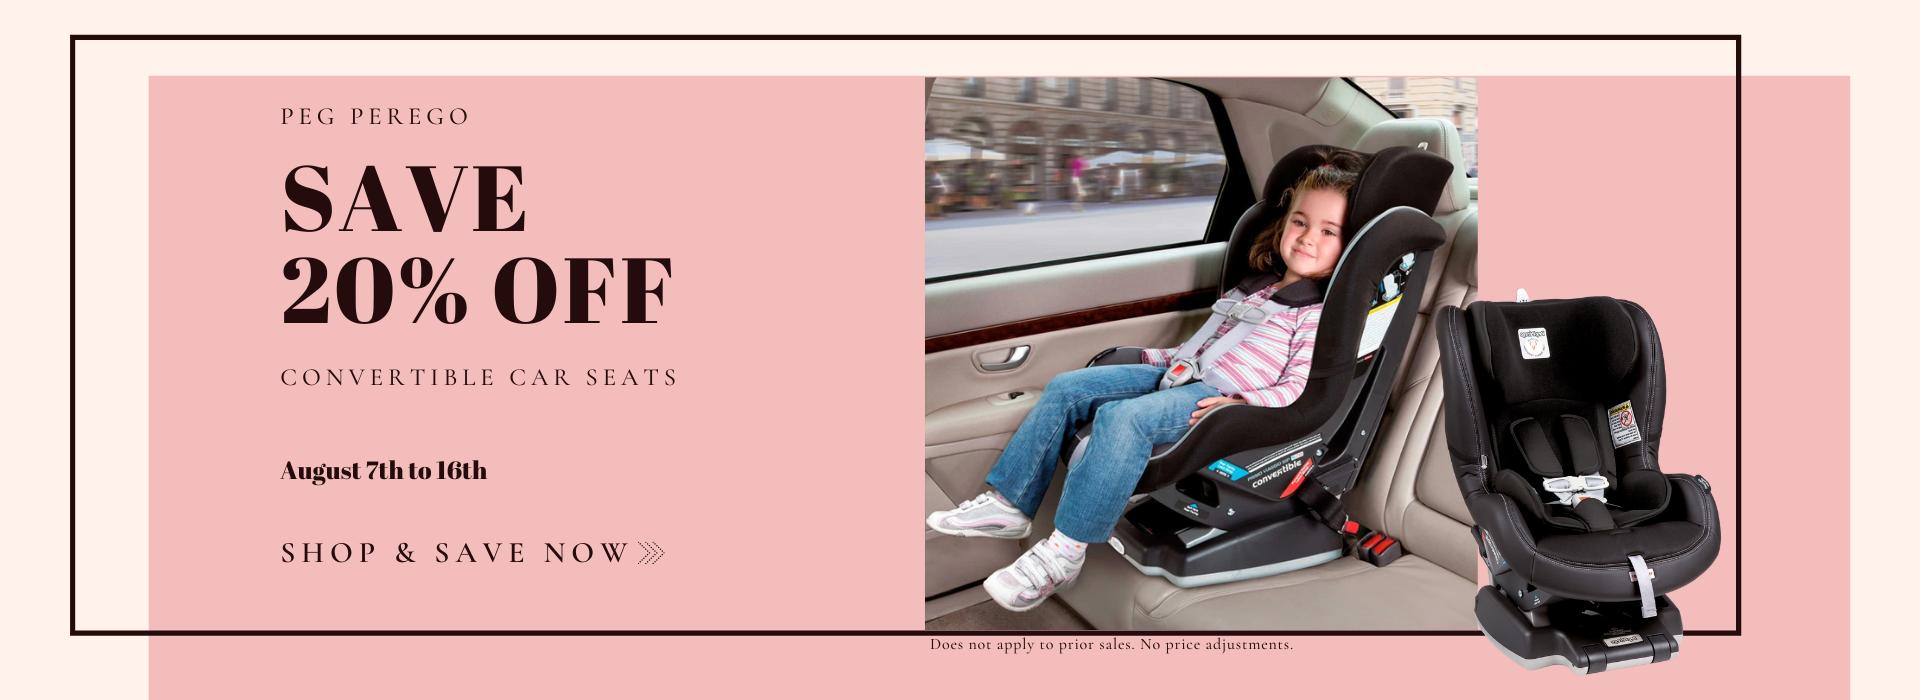 peg perego kinetic 5-65 car seat sale